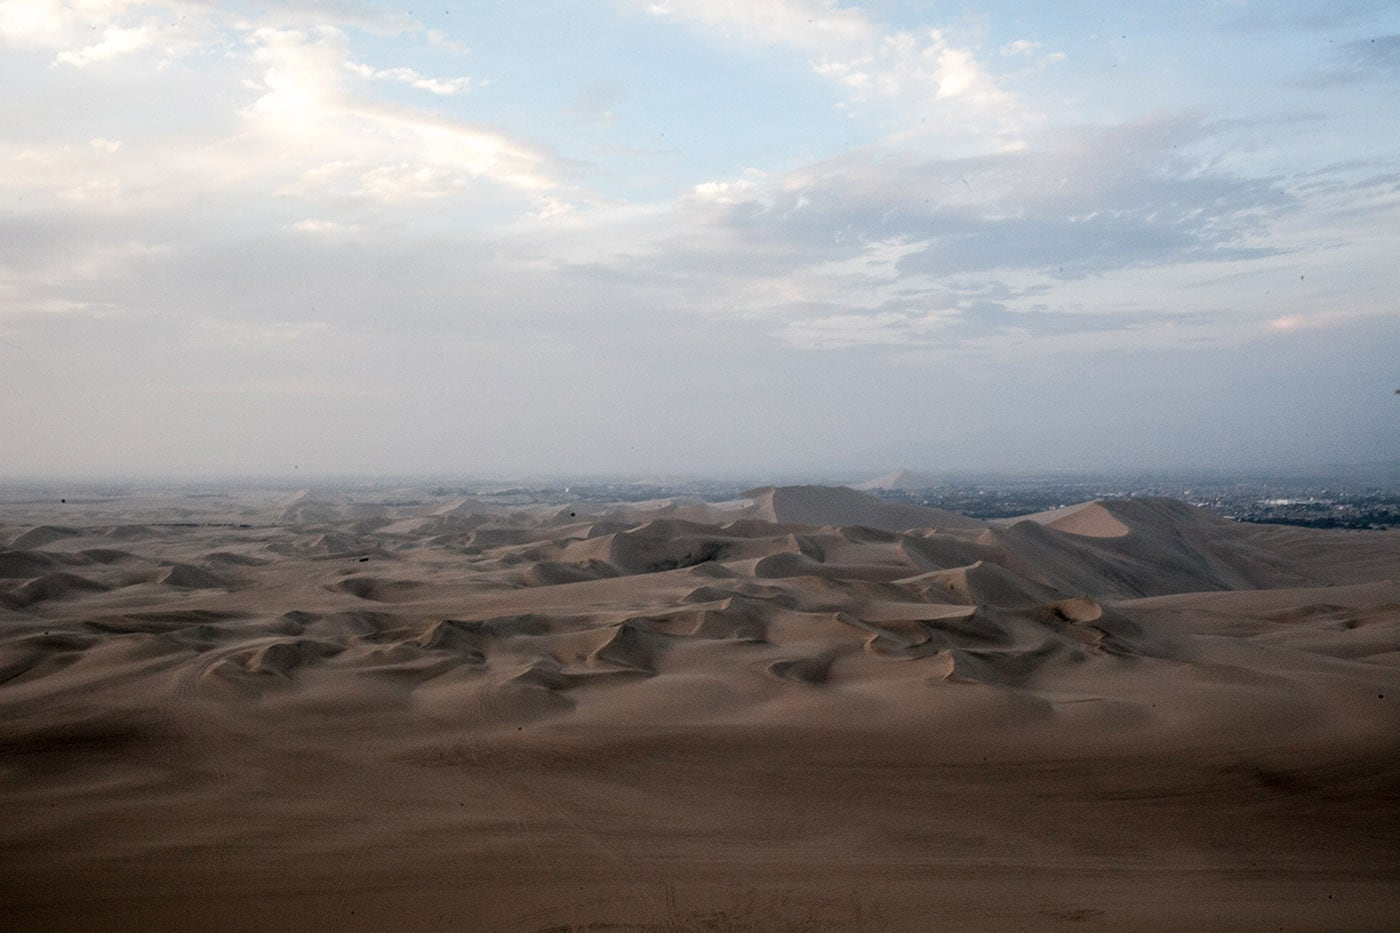 Sand dunes in Huacachina, Peru